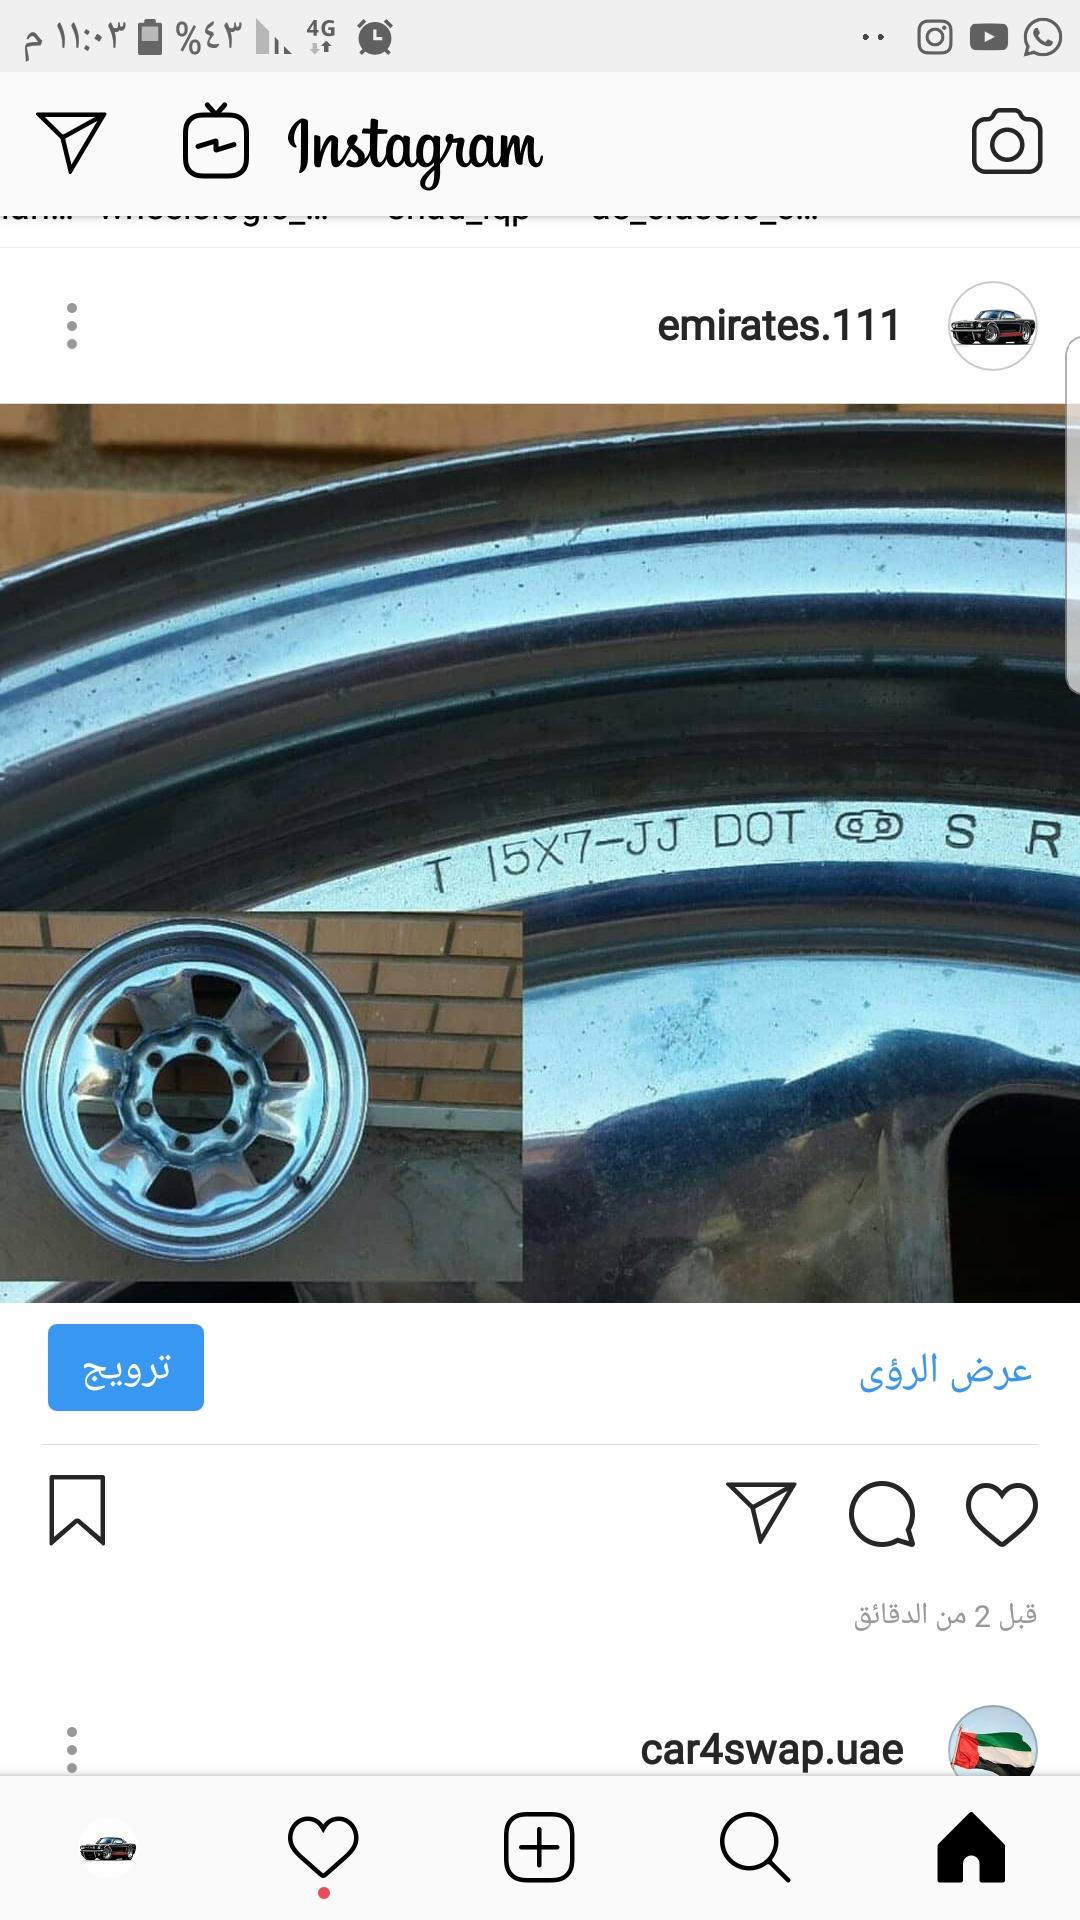 Screenshot_٢٠١٨٠٩٠٦-٢٣٠٣٥٩_Instagram.jpg